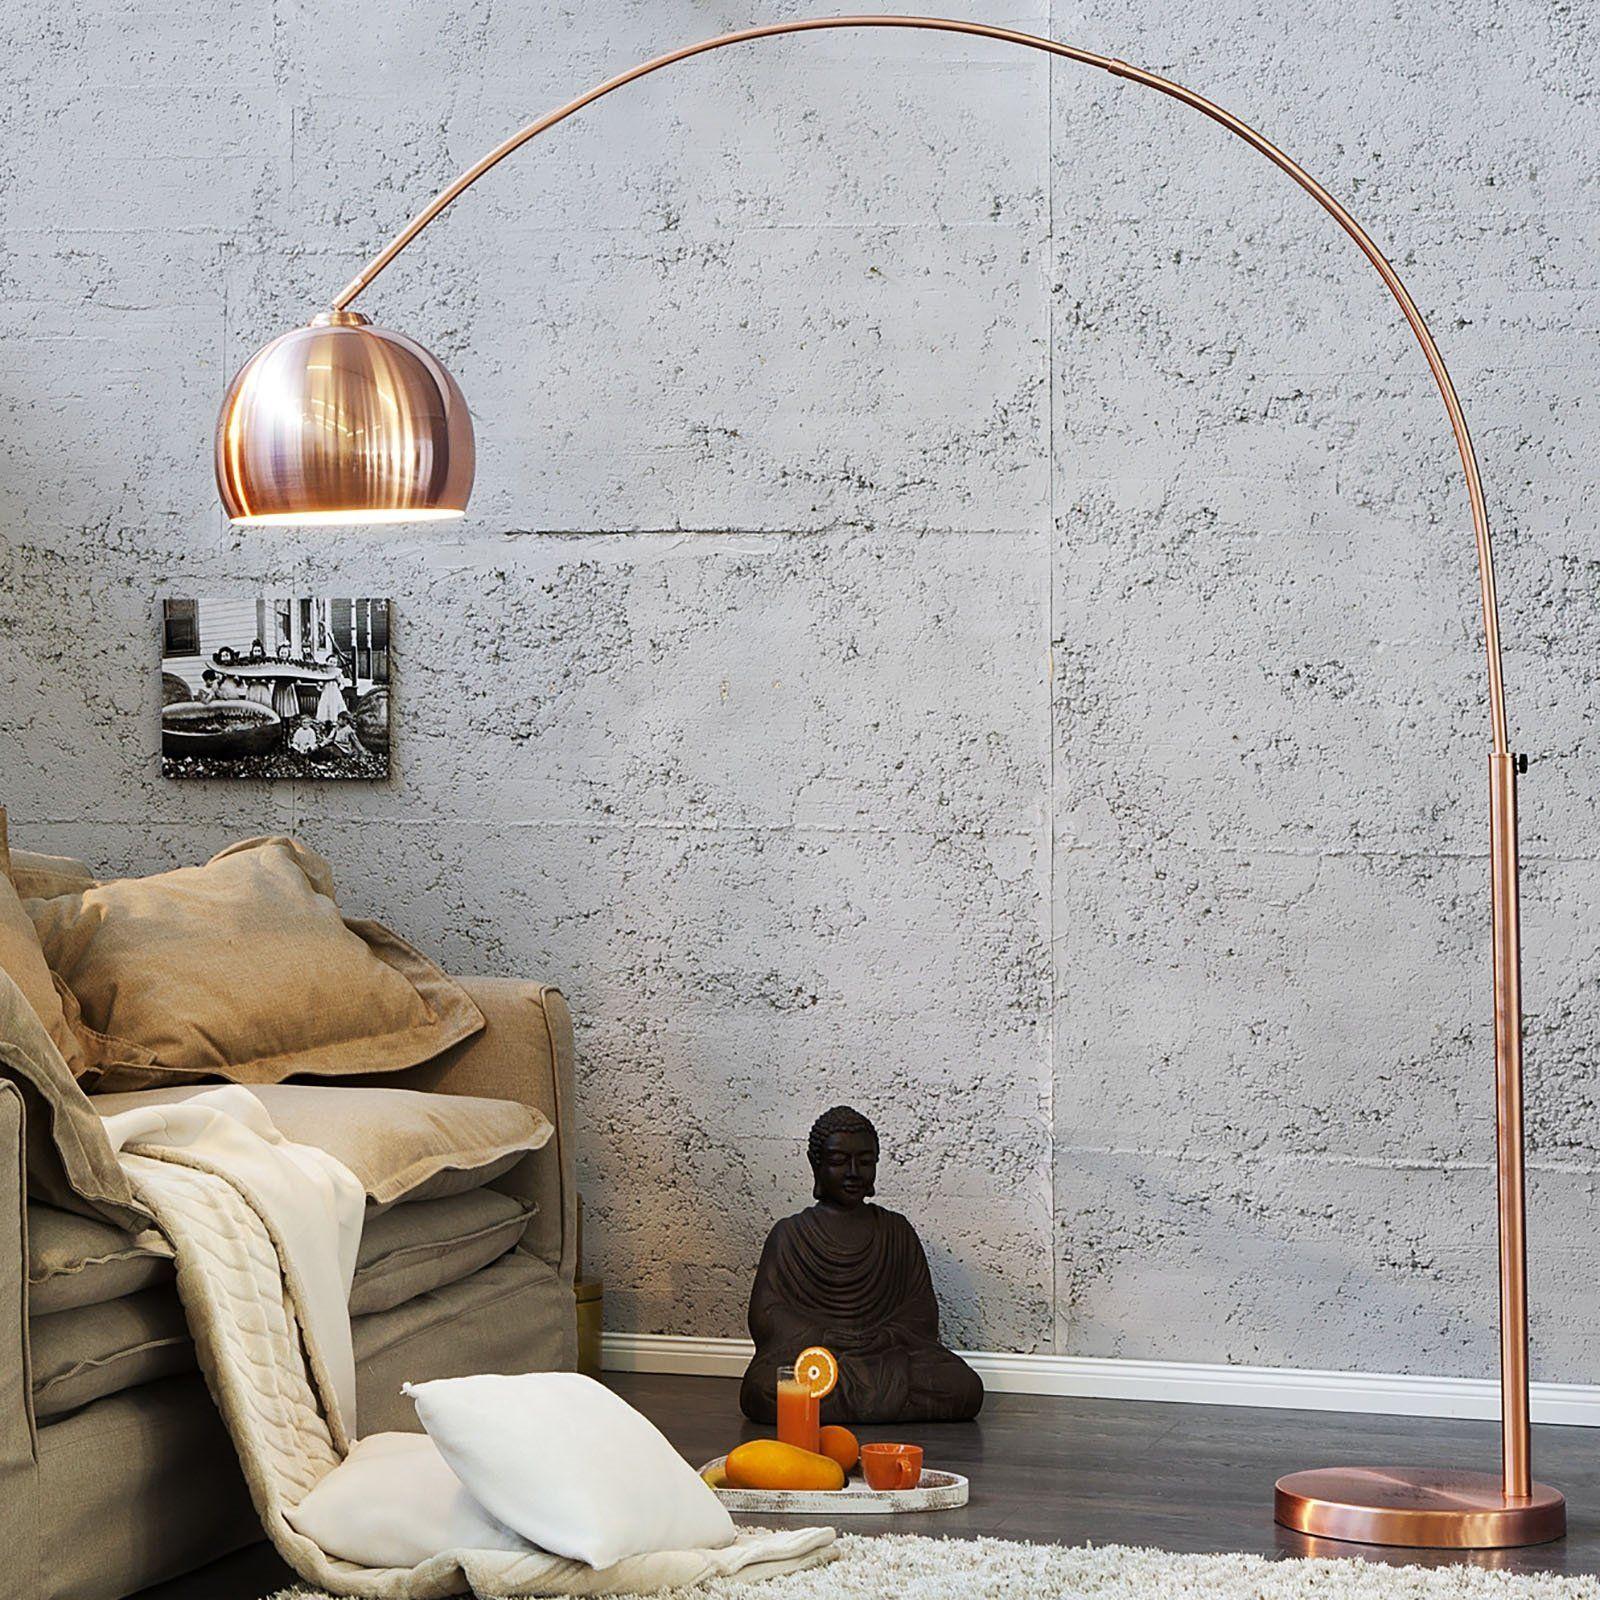 BIG BOW RETRO DESIGN LAMPE Stehlampe Bogenlampe Kupfer Ohne Dimmer Amazonde Kche